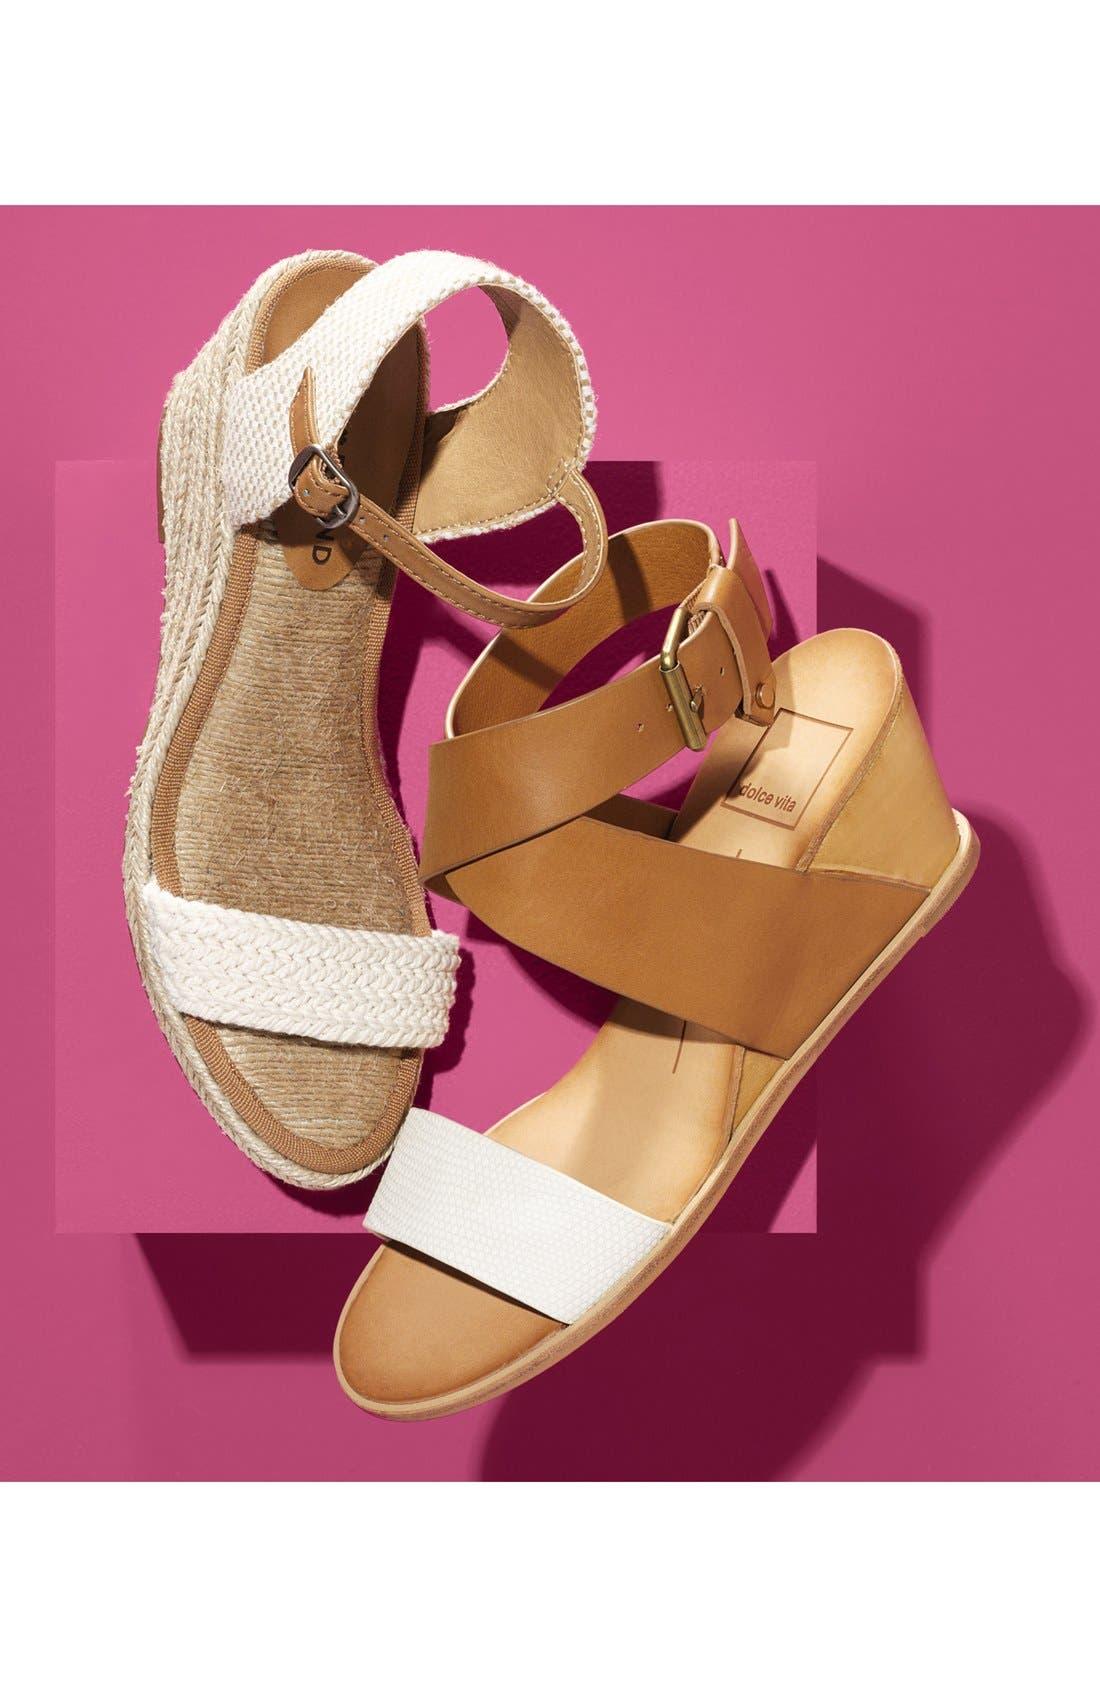 'Lola' Wedge Sandal,                             Alternate thumbnail 6, color,                             001